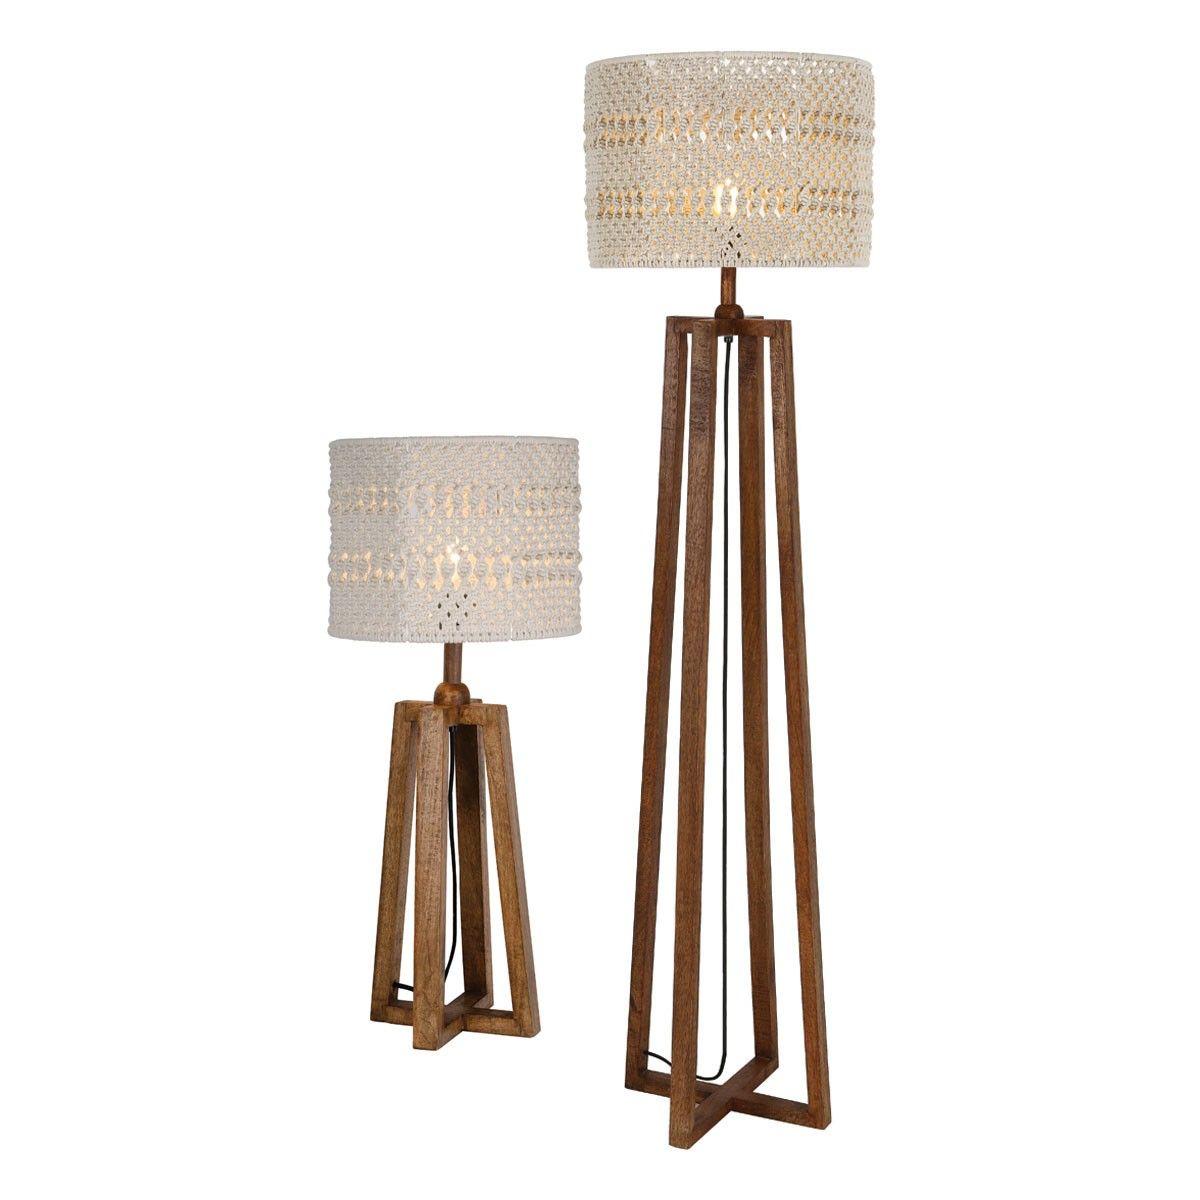 Devyn Table Floor Lamp Wood C W Cream Macrame Shade The Devyn Table And Floor Lamp Twin Pack Has Washed Dark Wo Lamp Sets Wood Floor Lamp Floor Lamp Table